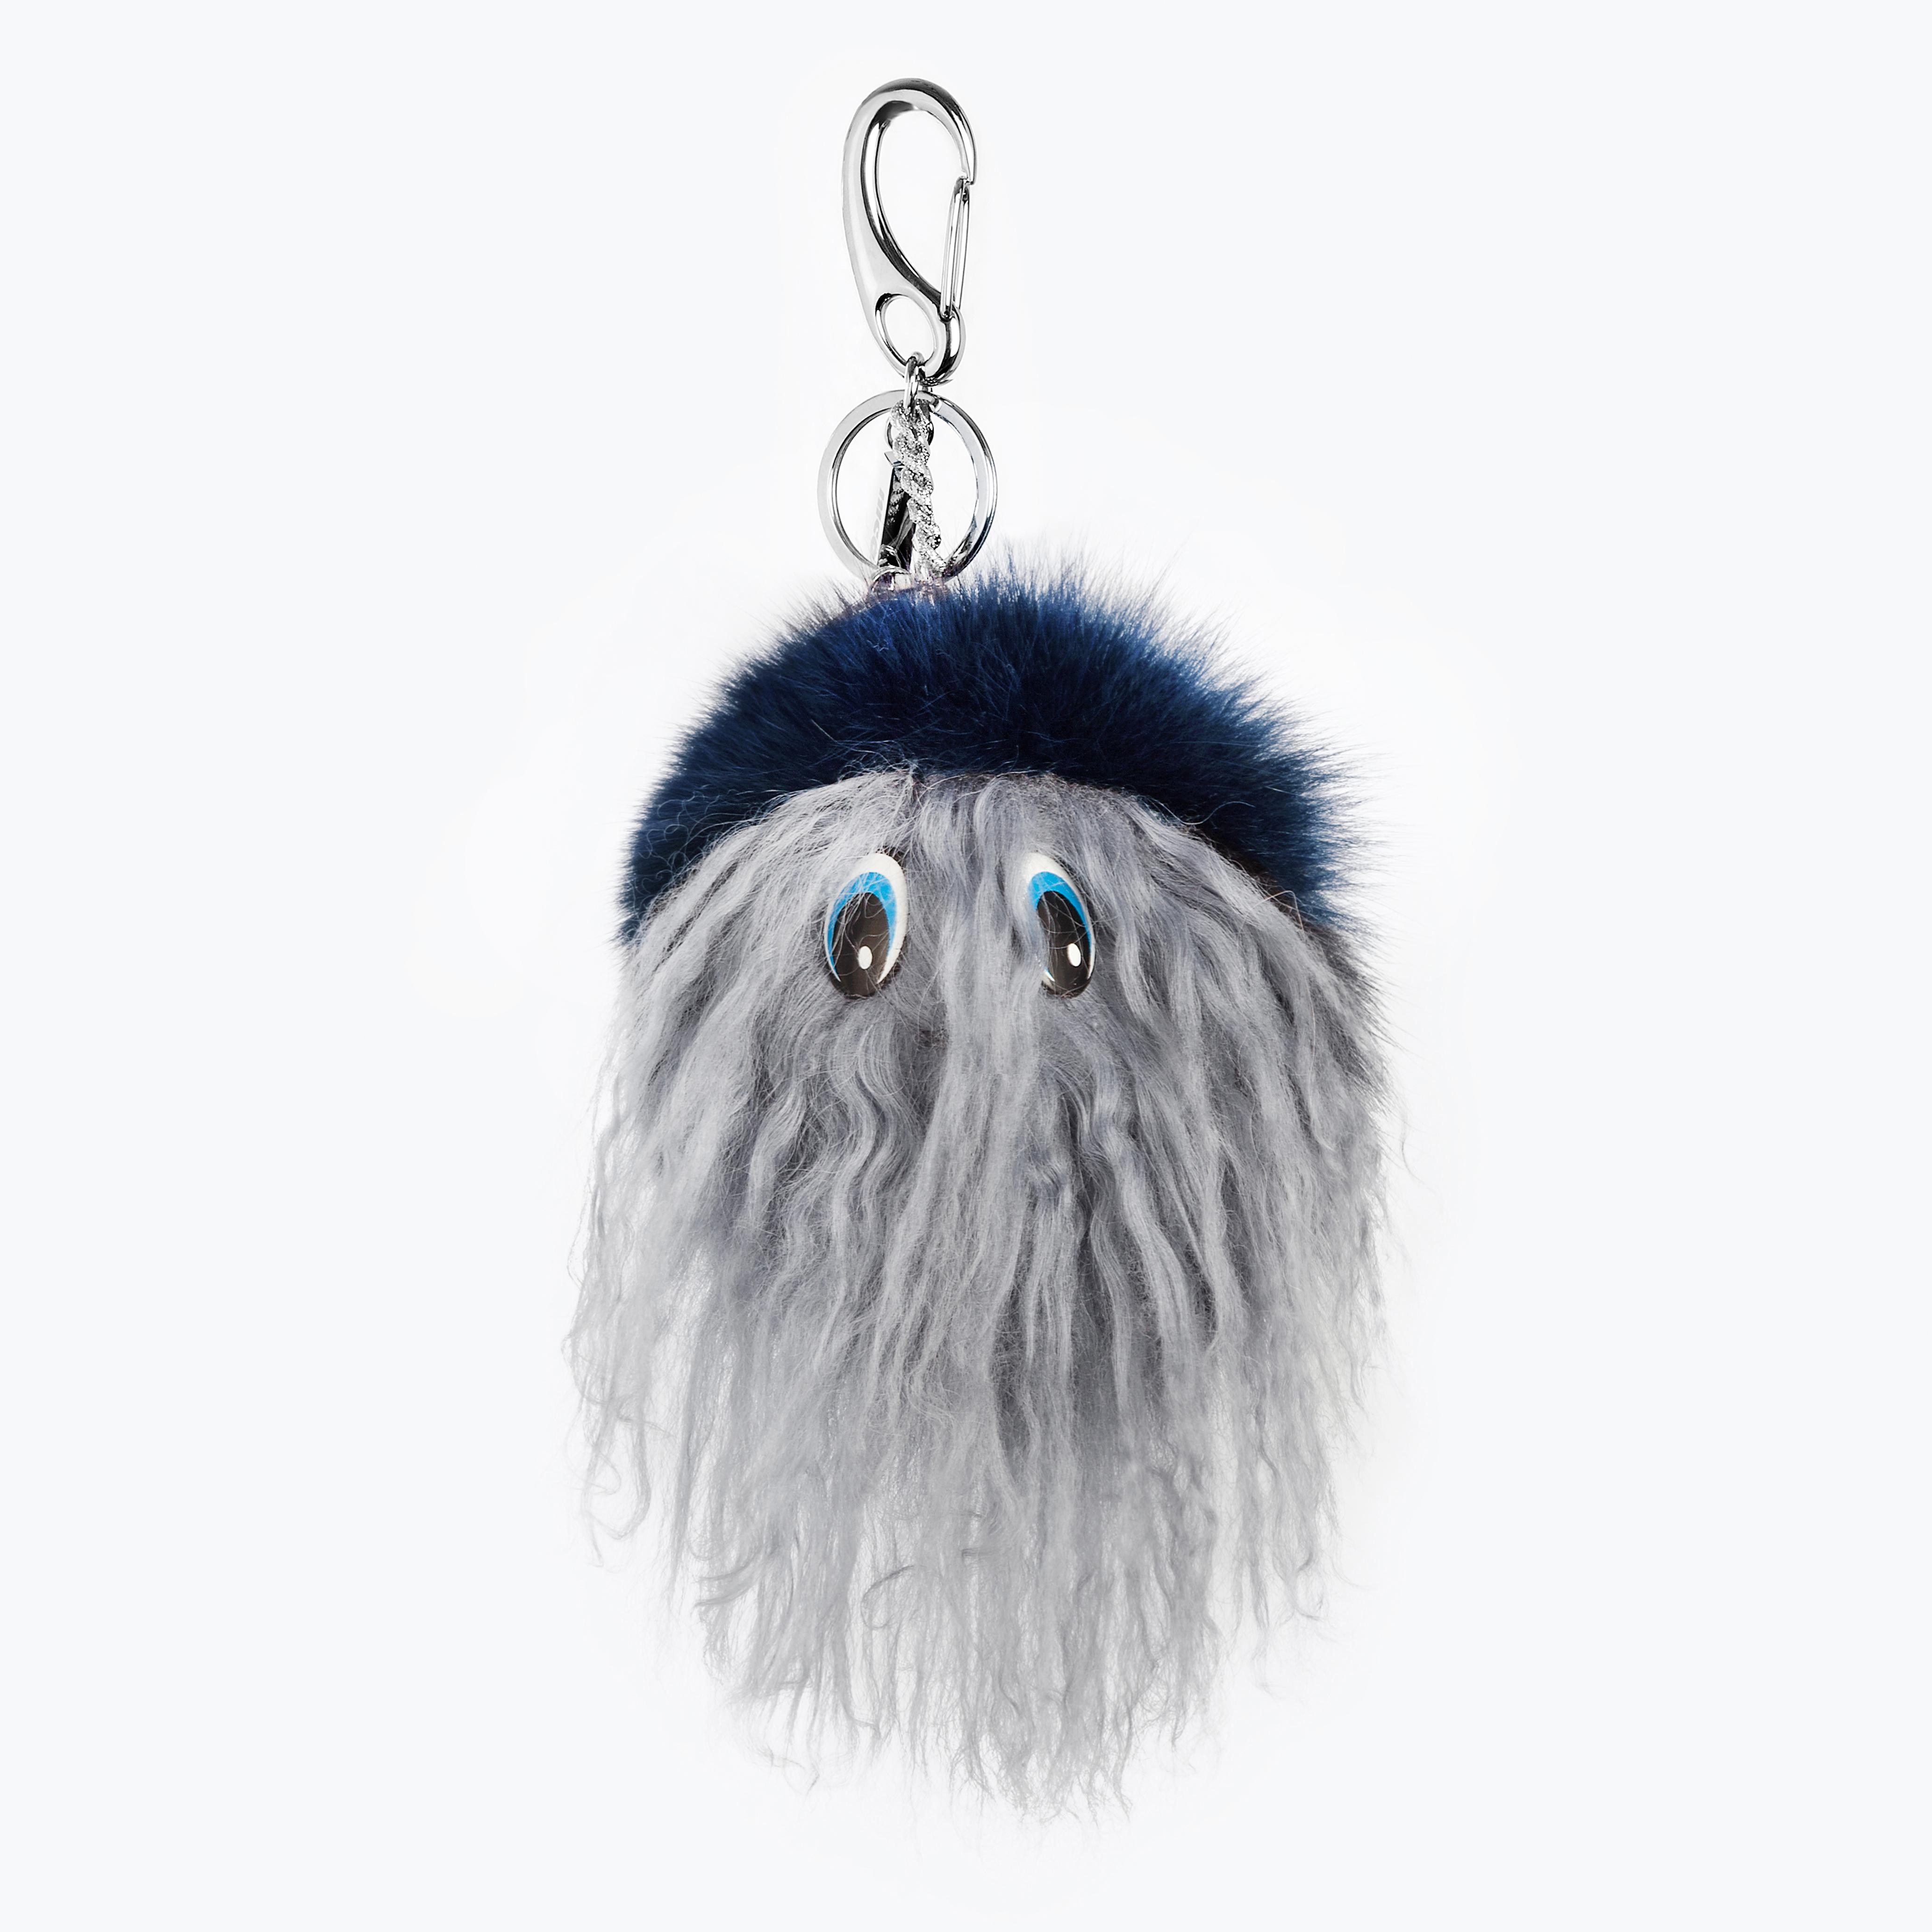 Portachiavi pelliccia volpe pon pon charms borsa blu grigio perla  e5fab6b3ec28